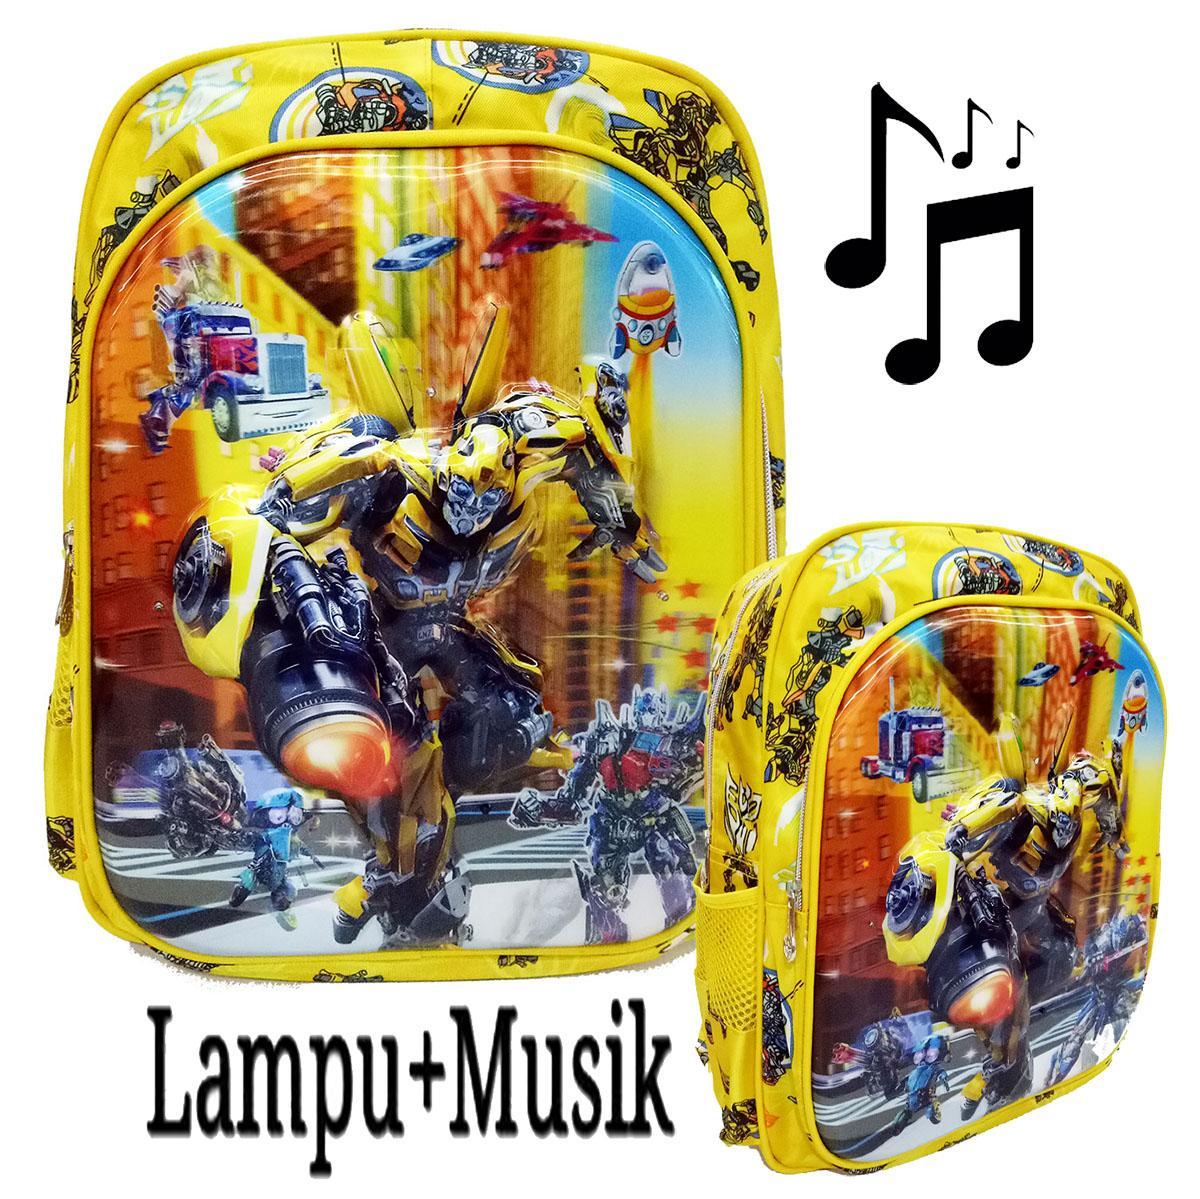 Onlan Tas Anak Sekolah SD LAMPU + MUSIC Karakter Transformers Bumble Bee 5D Timbul Hologram Import